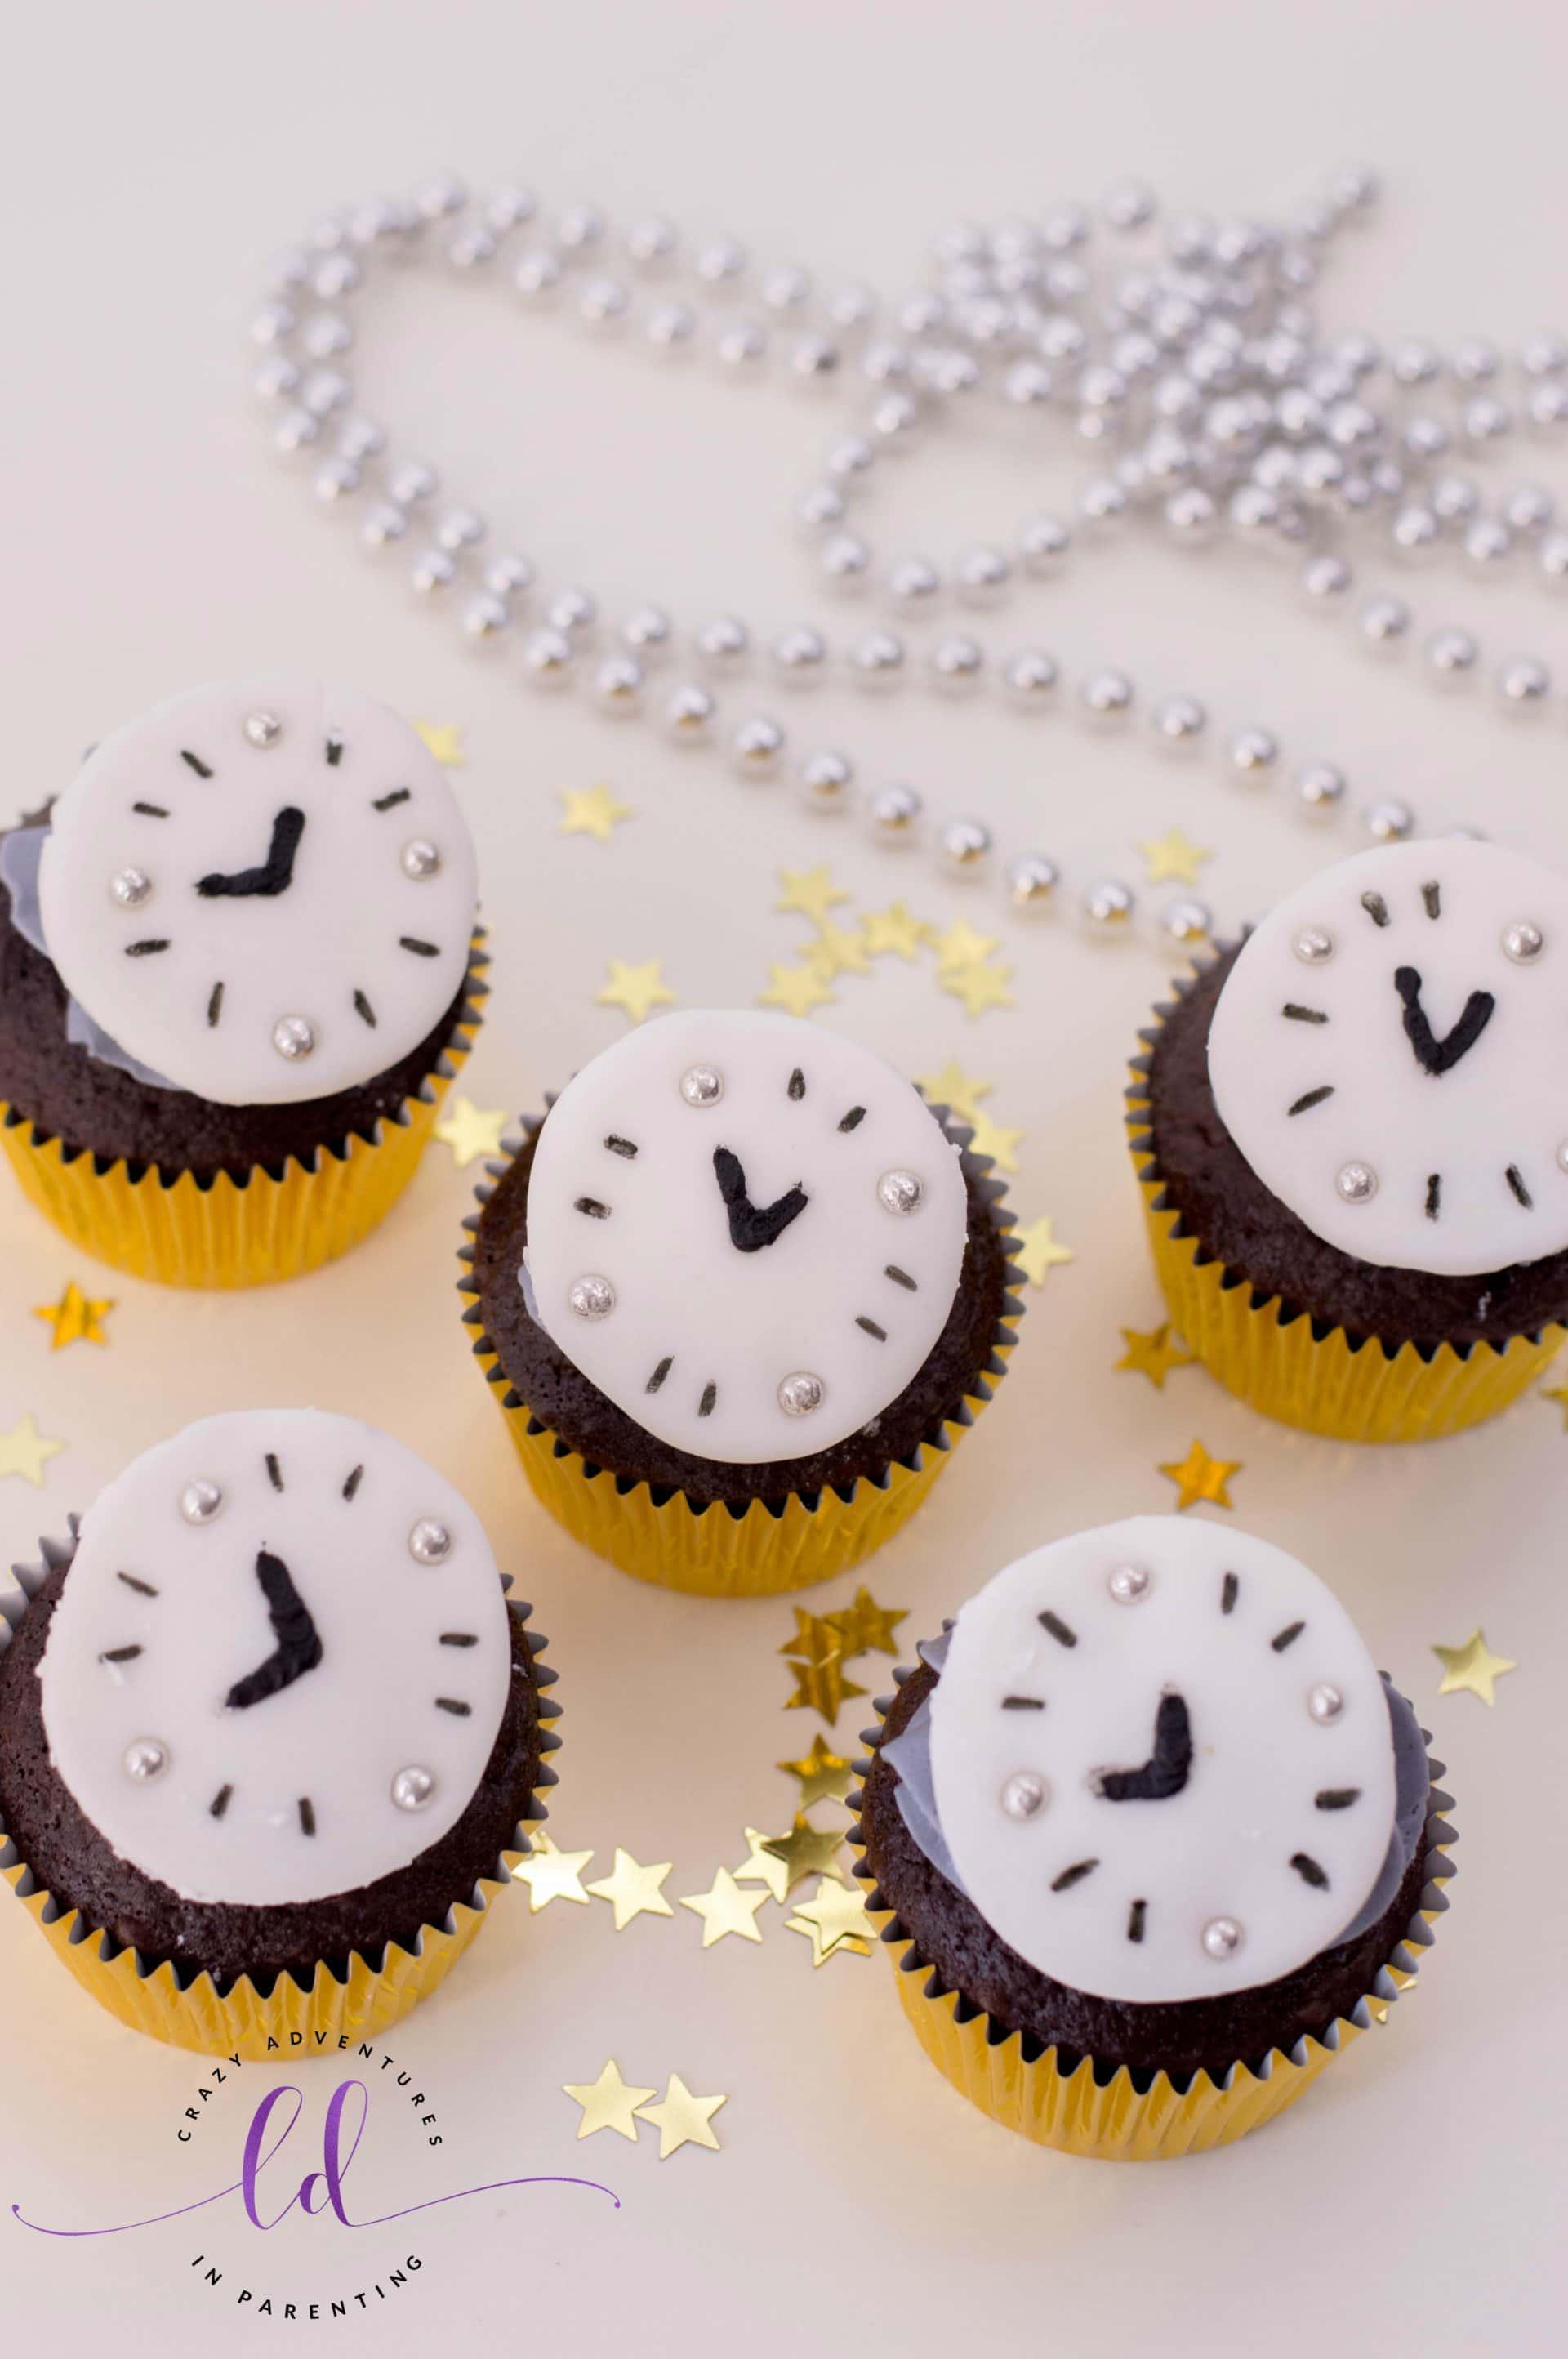 Countdown Cupcakes Recipe